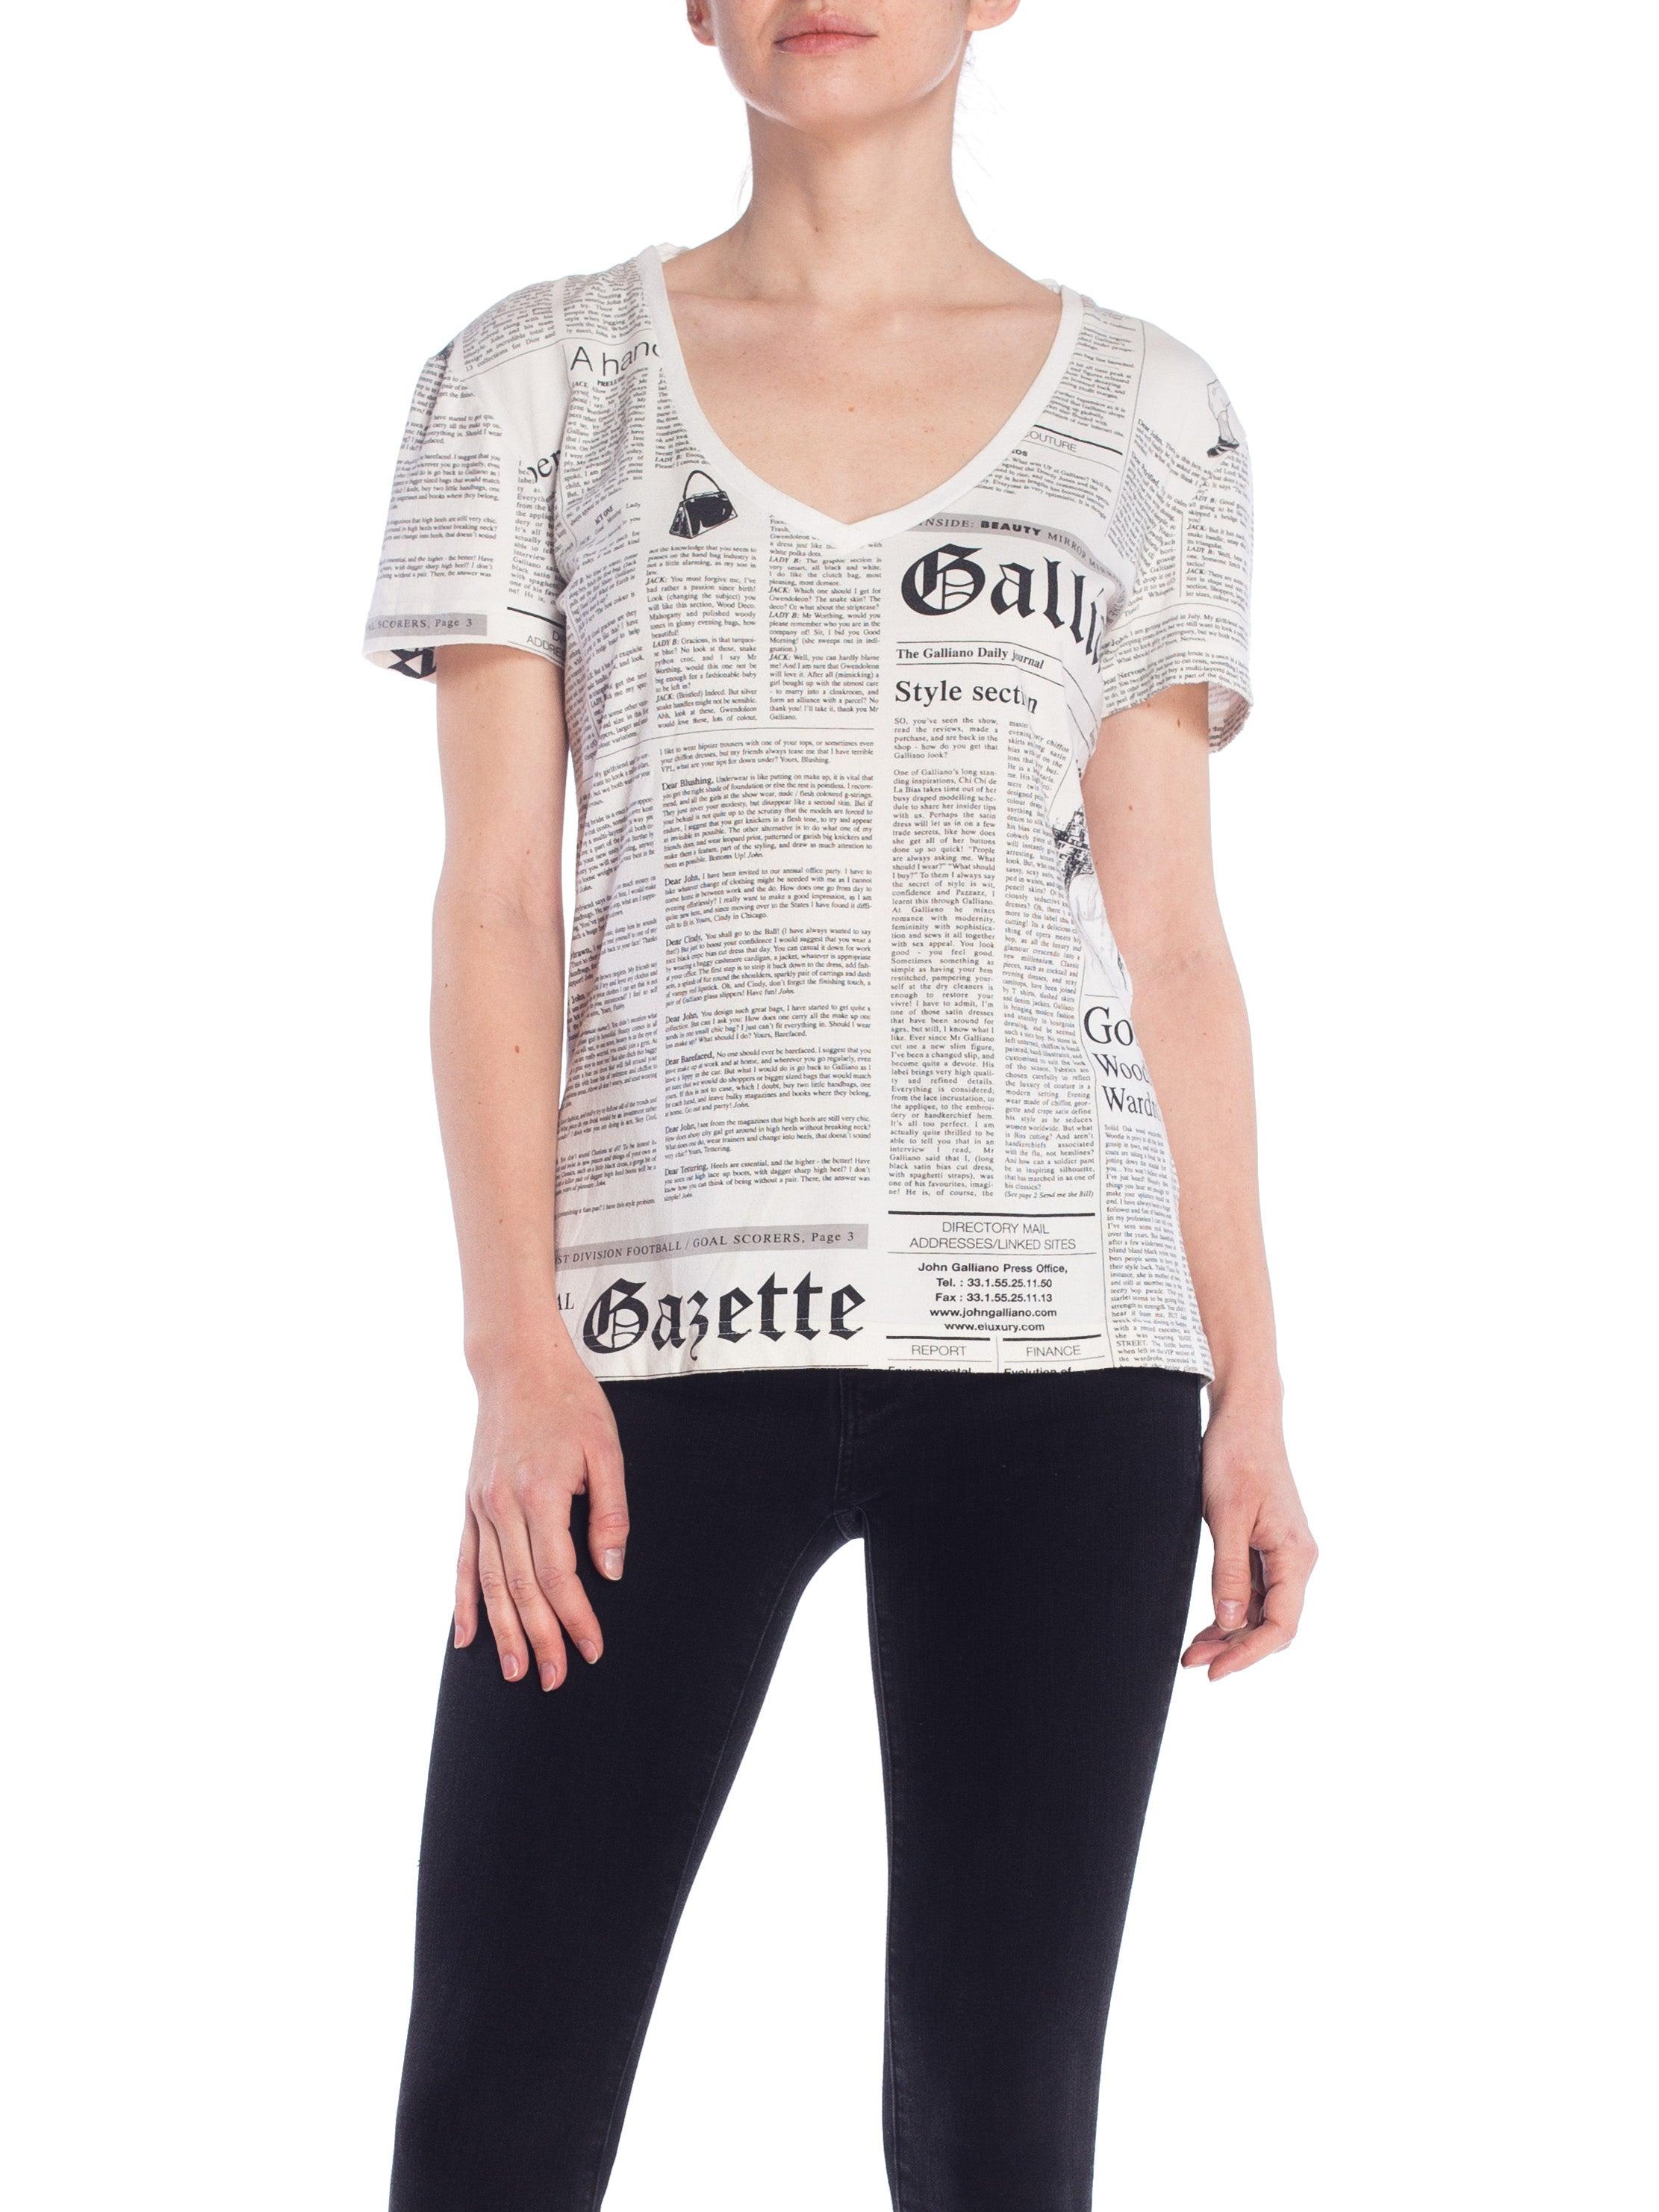 9613dbb7 John Galliano Gazette Newspaper Print T-Shirt For Sale at 1stdibs